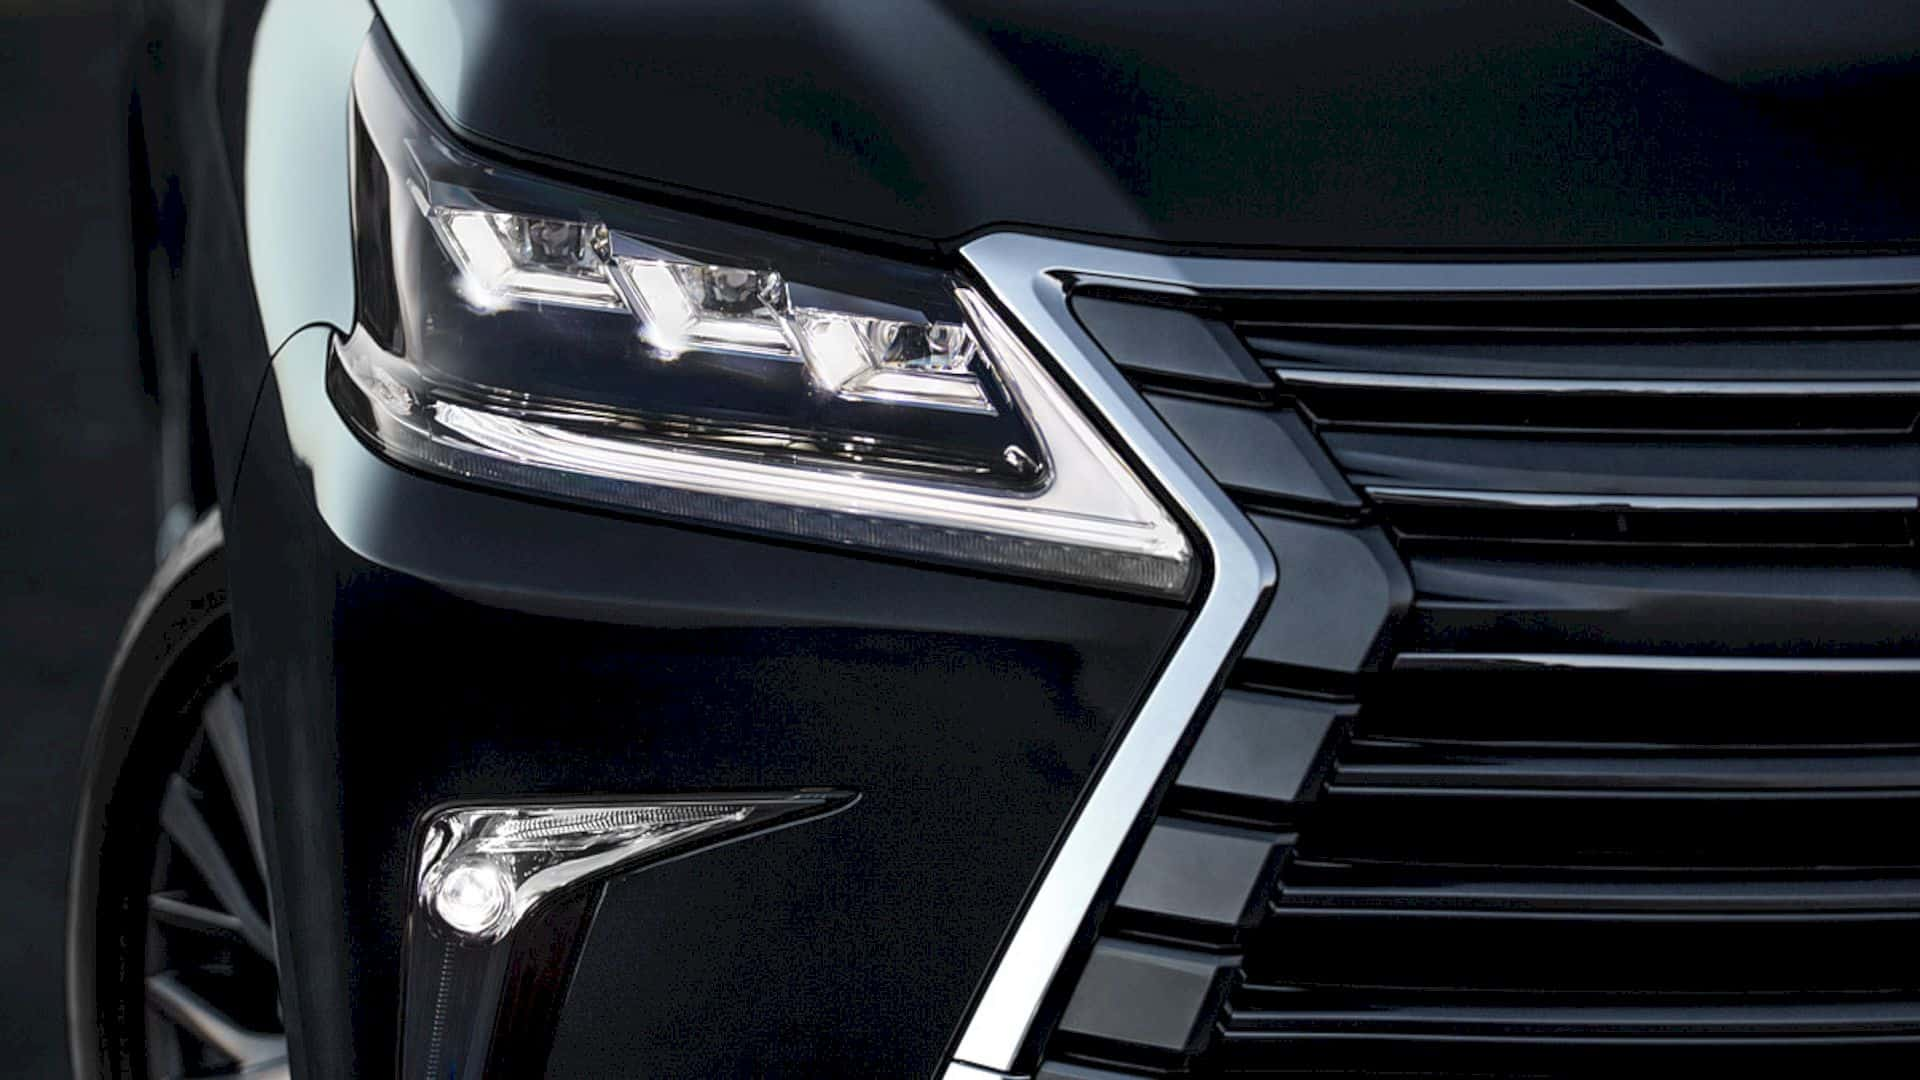 2019 Lexus Lx 570 10